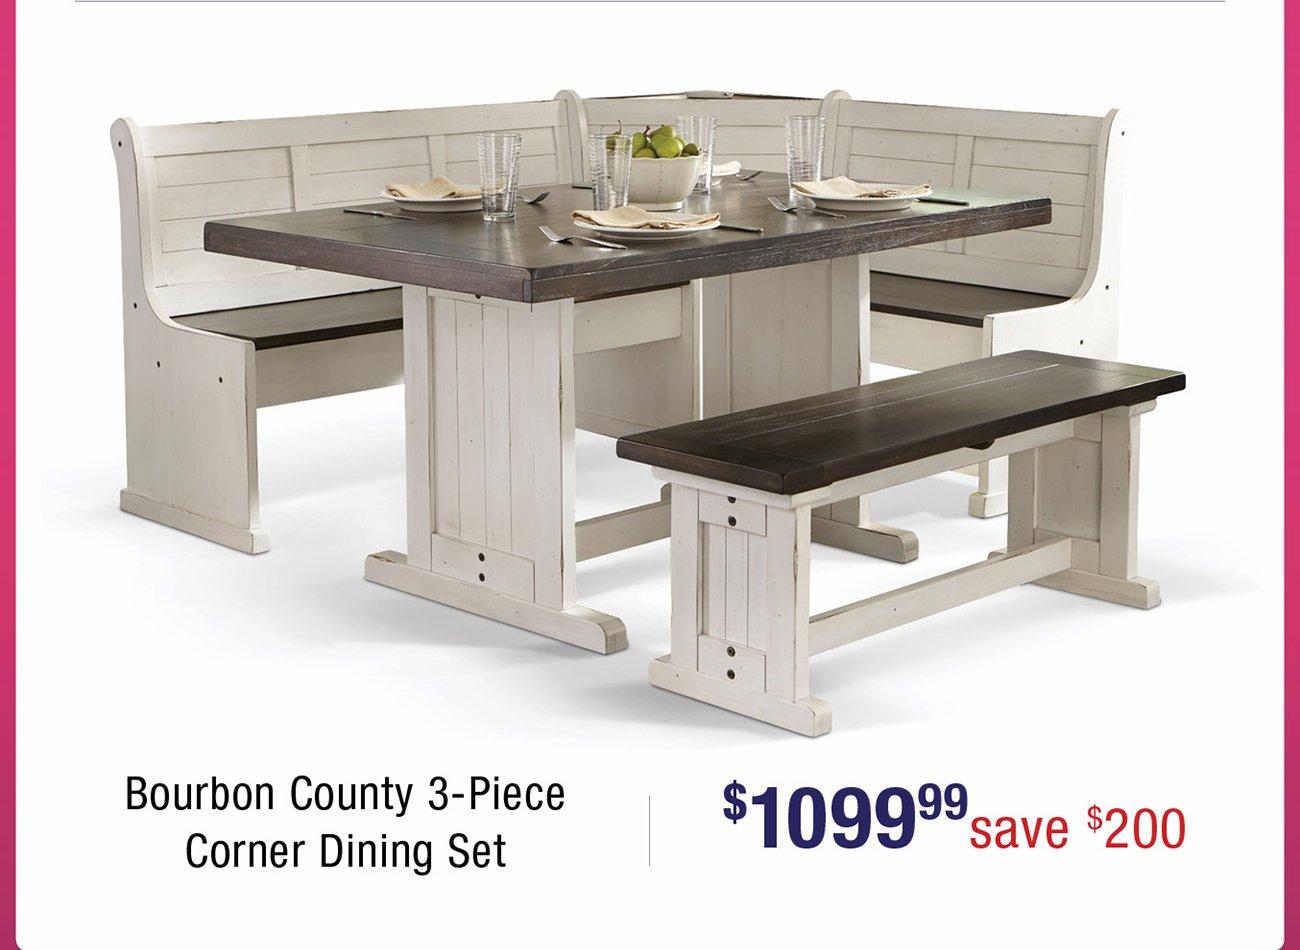 Bourbon-count-dining-set